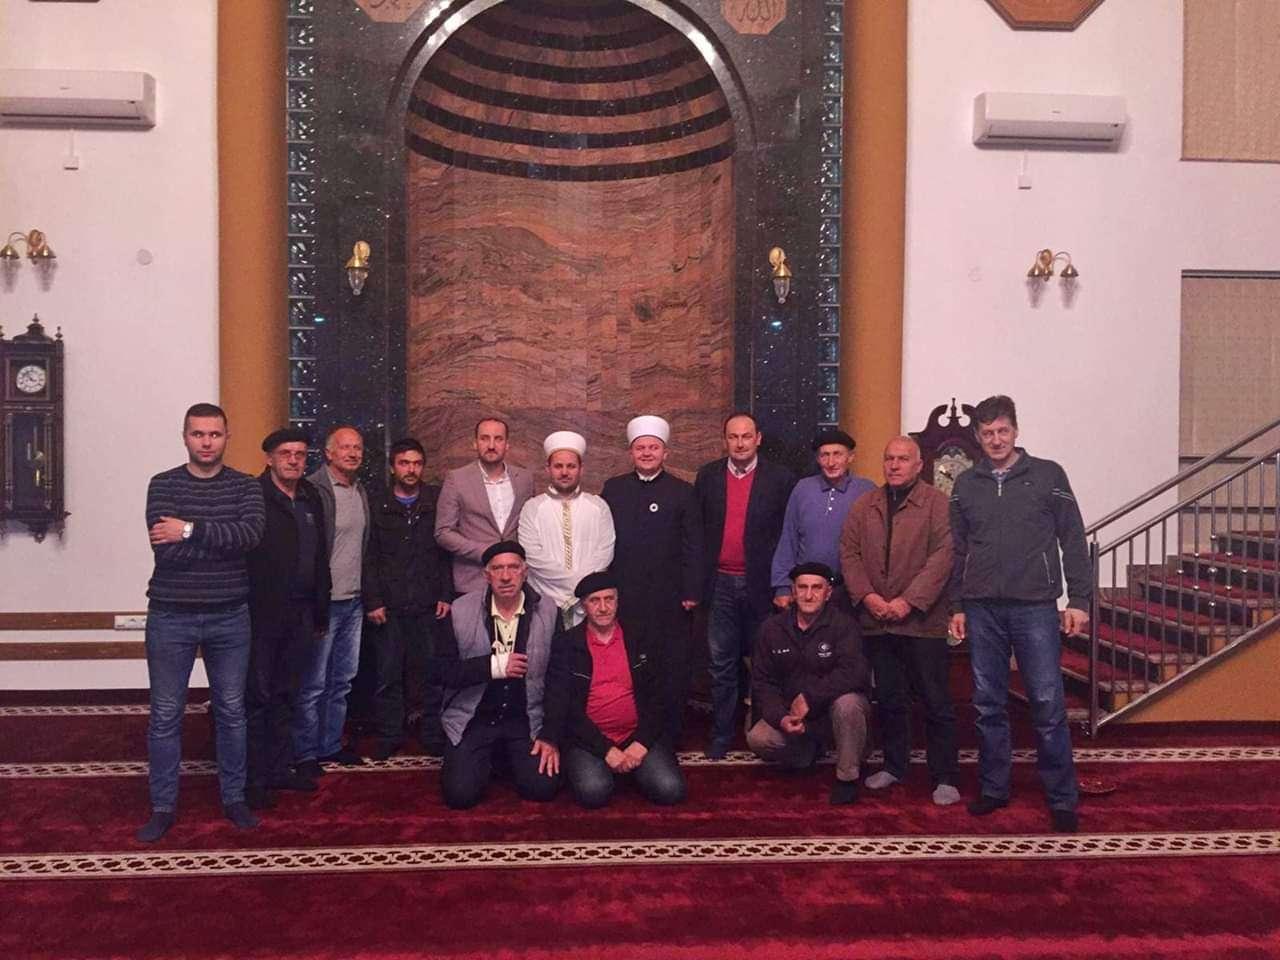 Hafiz Mehmet iz Turske, gost Medžlisa IZ Travnik prve sedmice ramazana